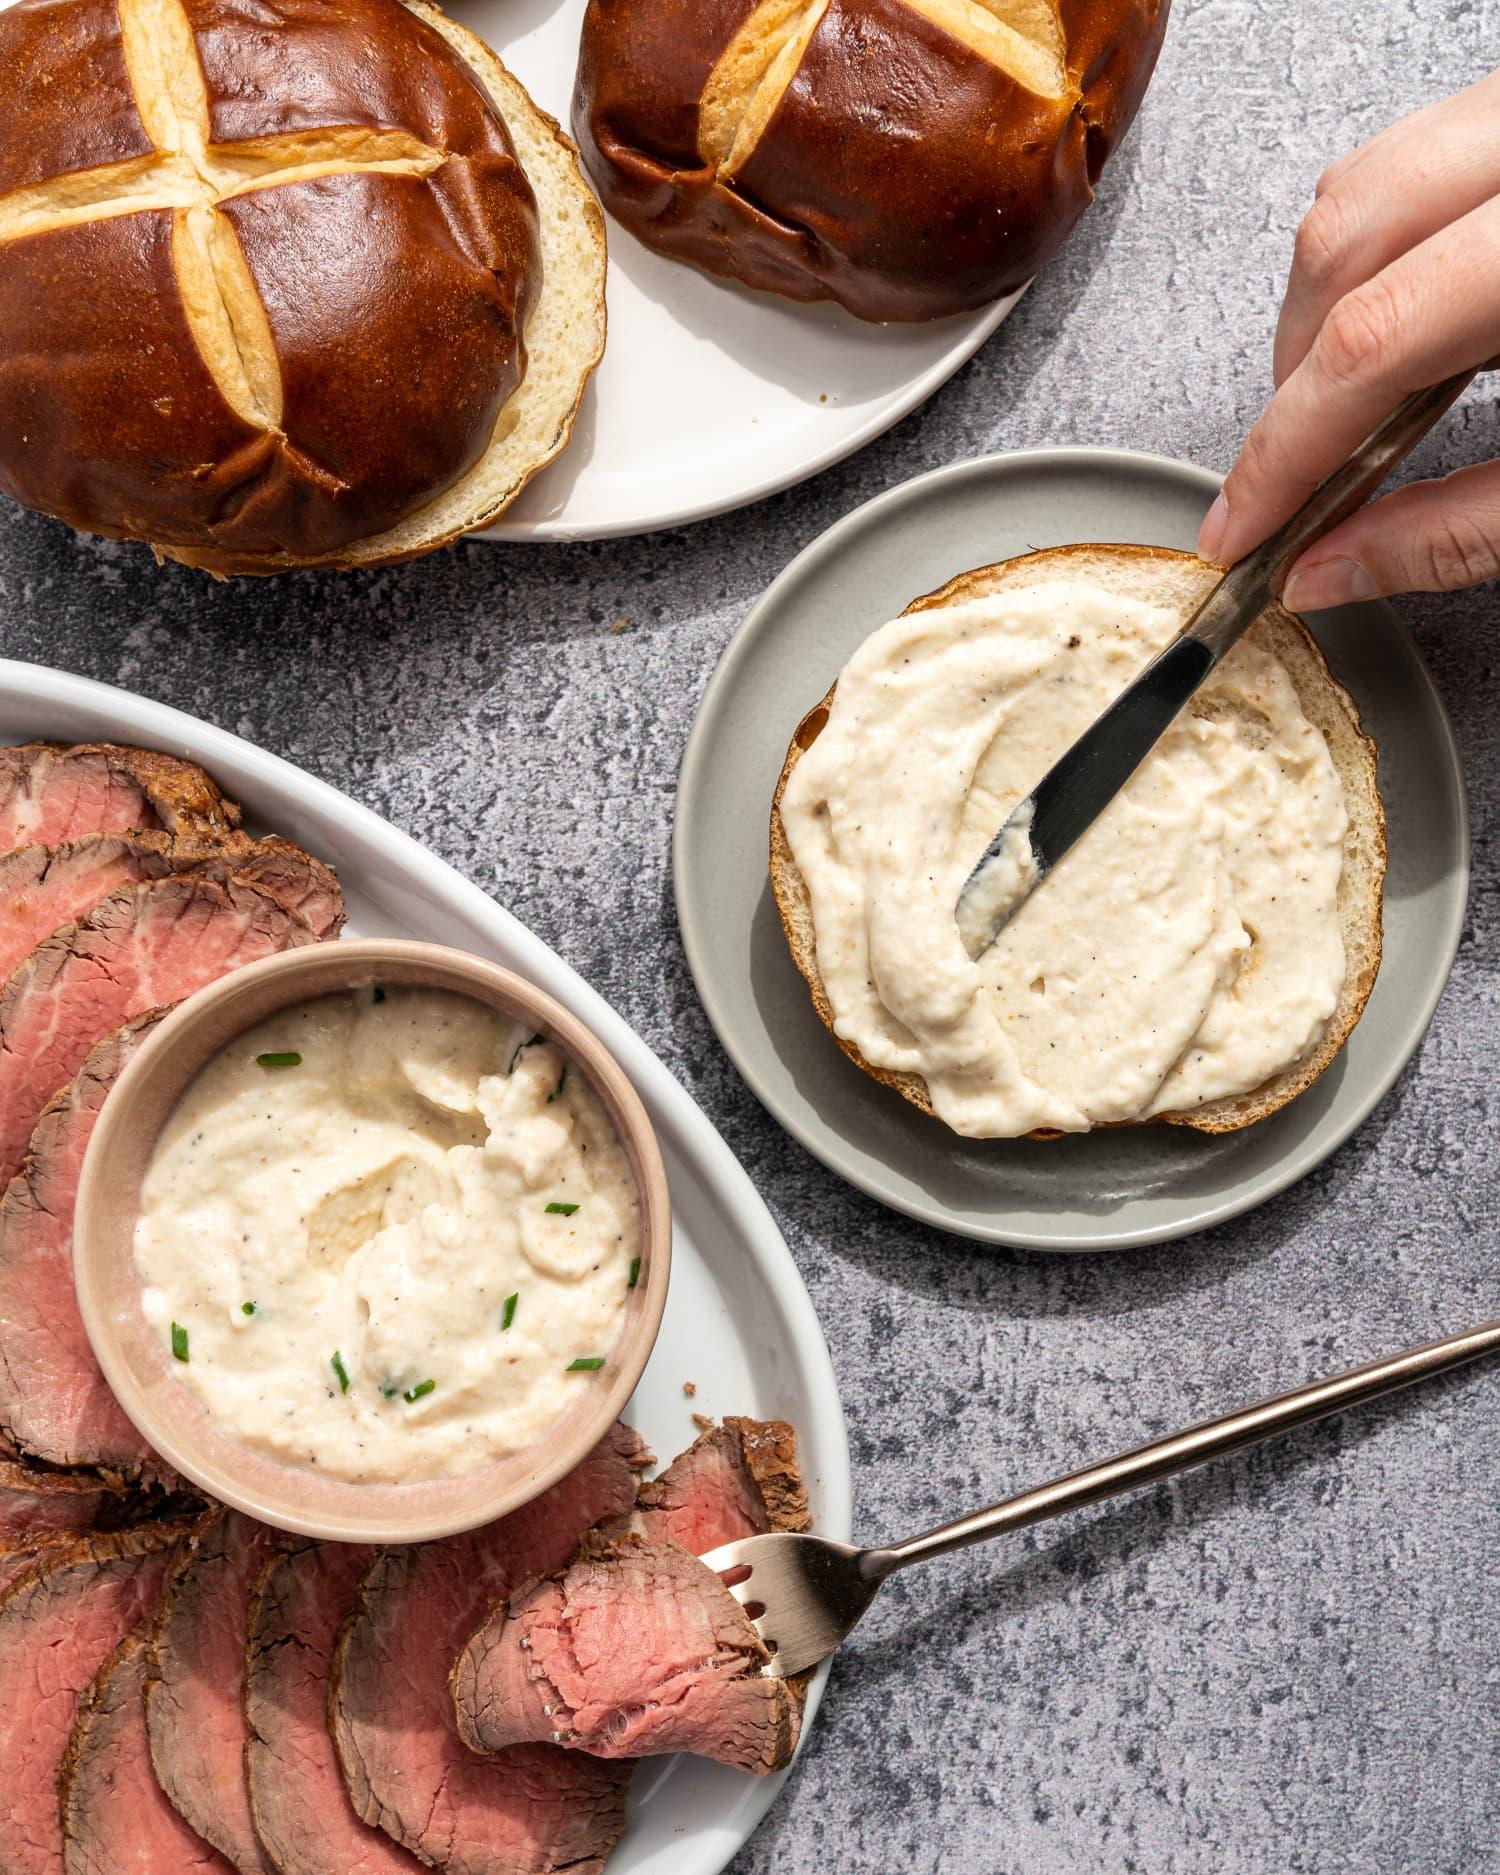 Creamy Horseradish Sauce = Your New Favorite Condiment